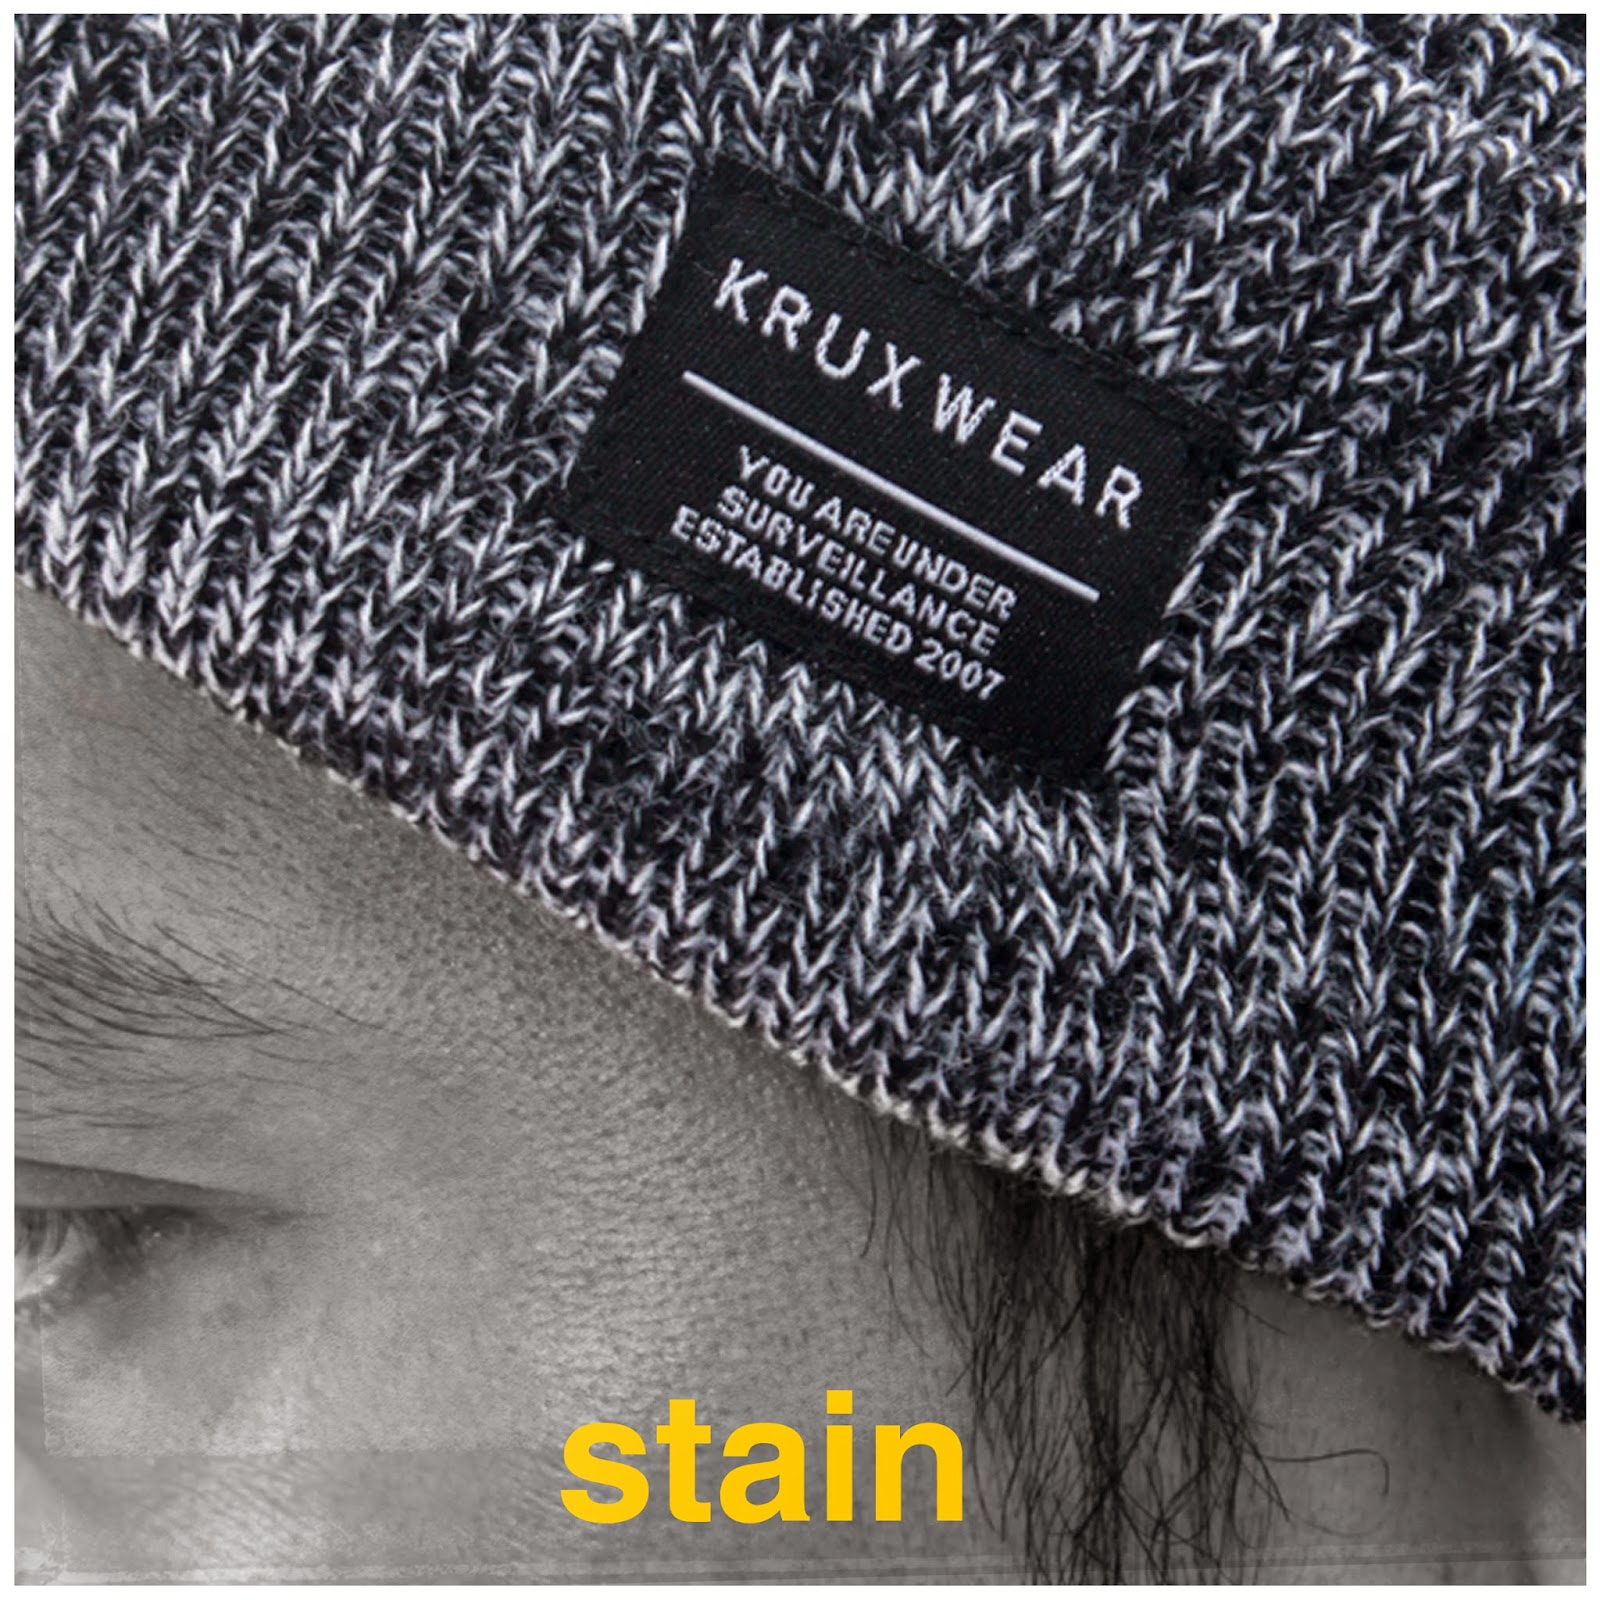 http://kruxwear.blogspot.com/2014/08/kruxwear-stain.html